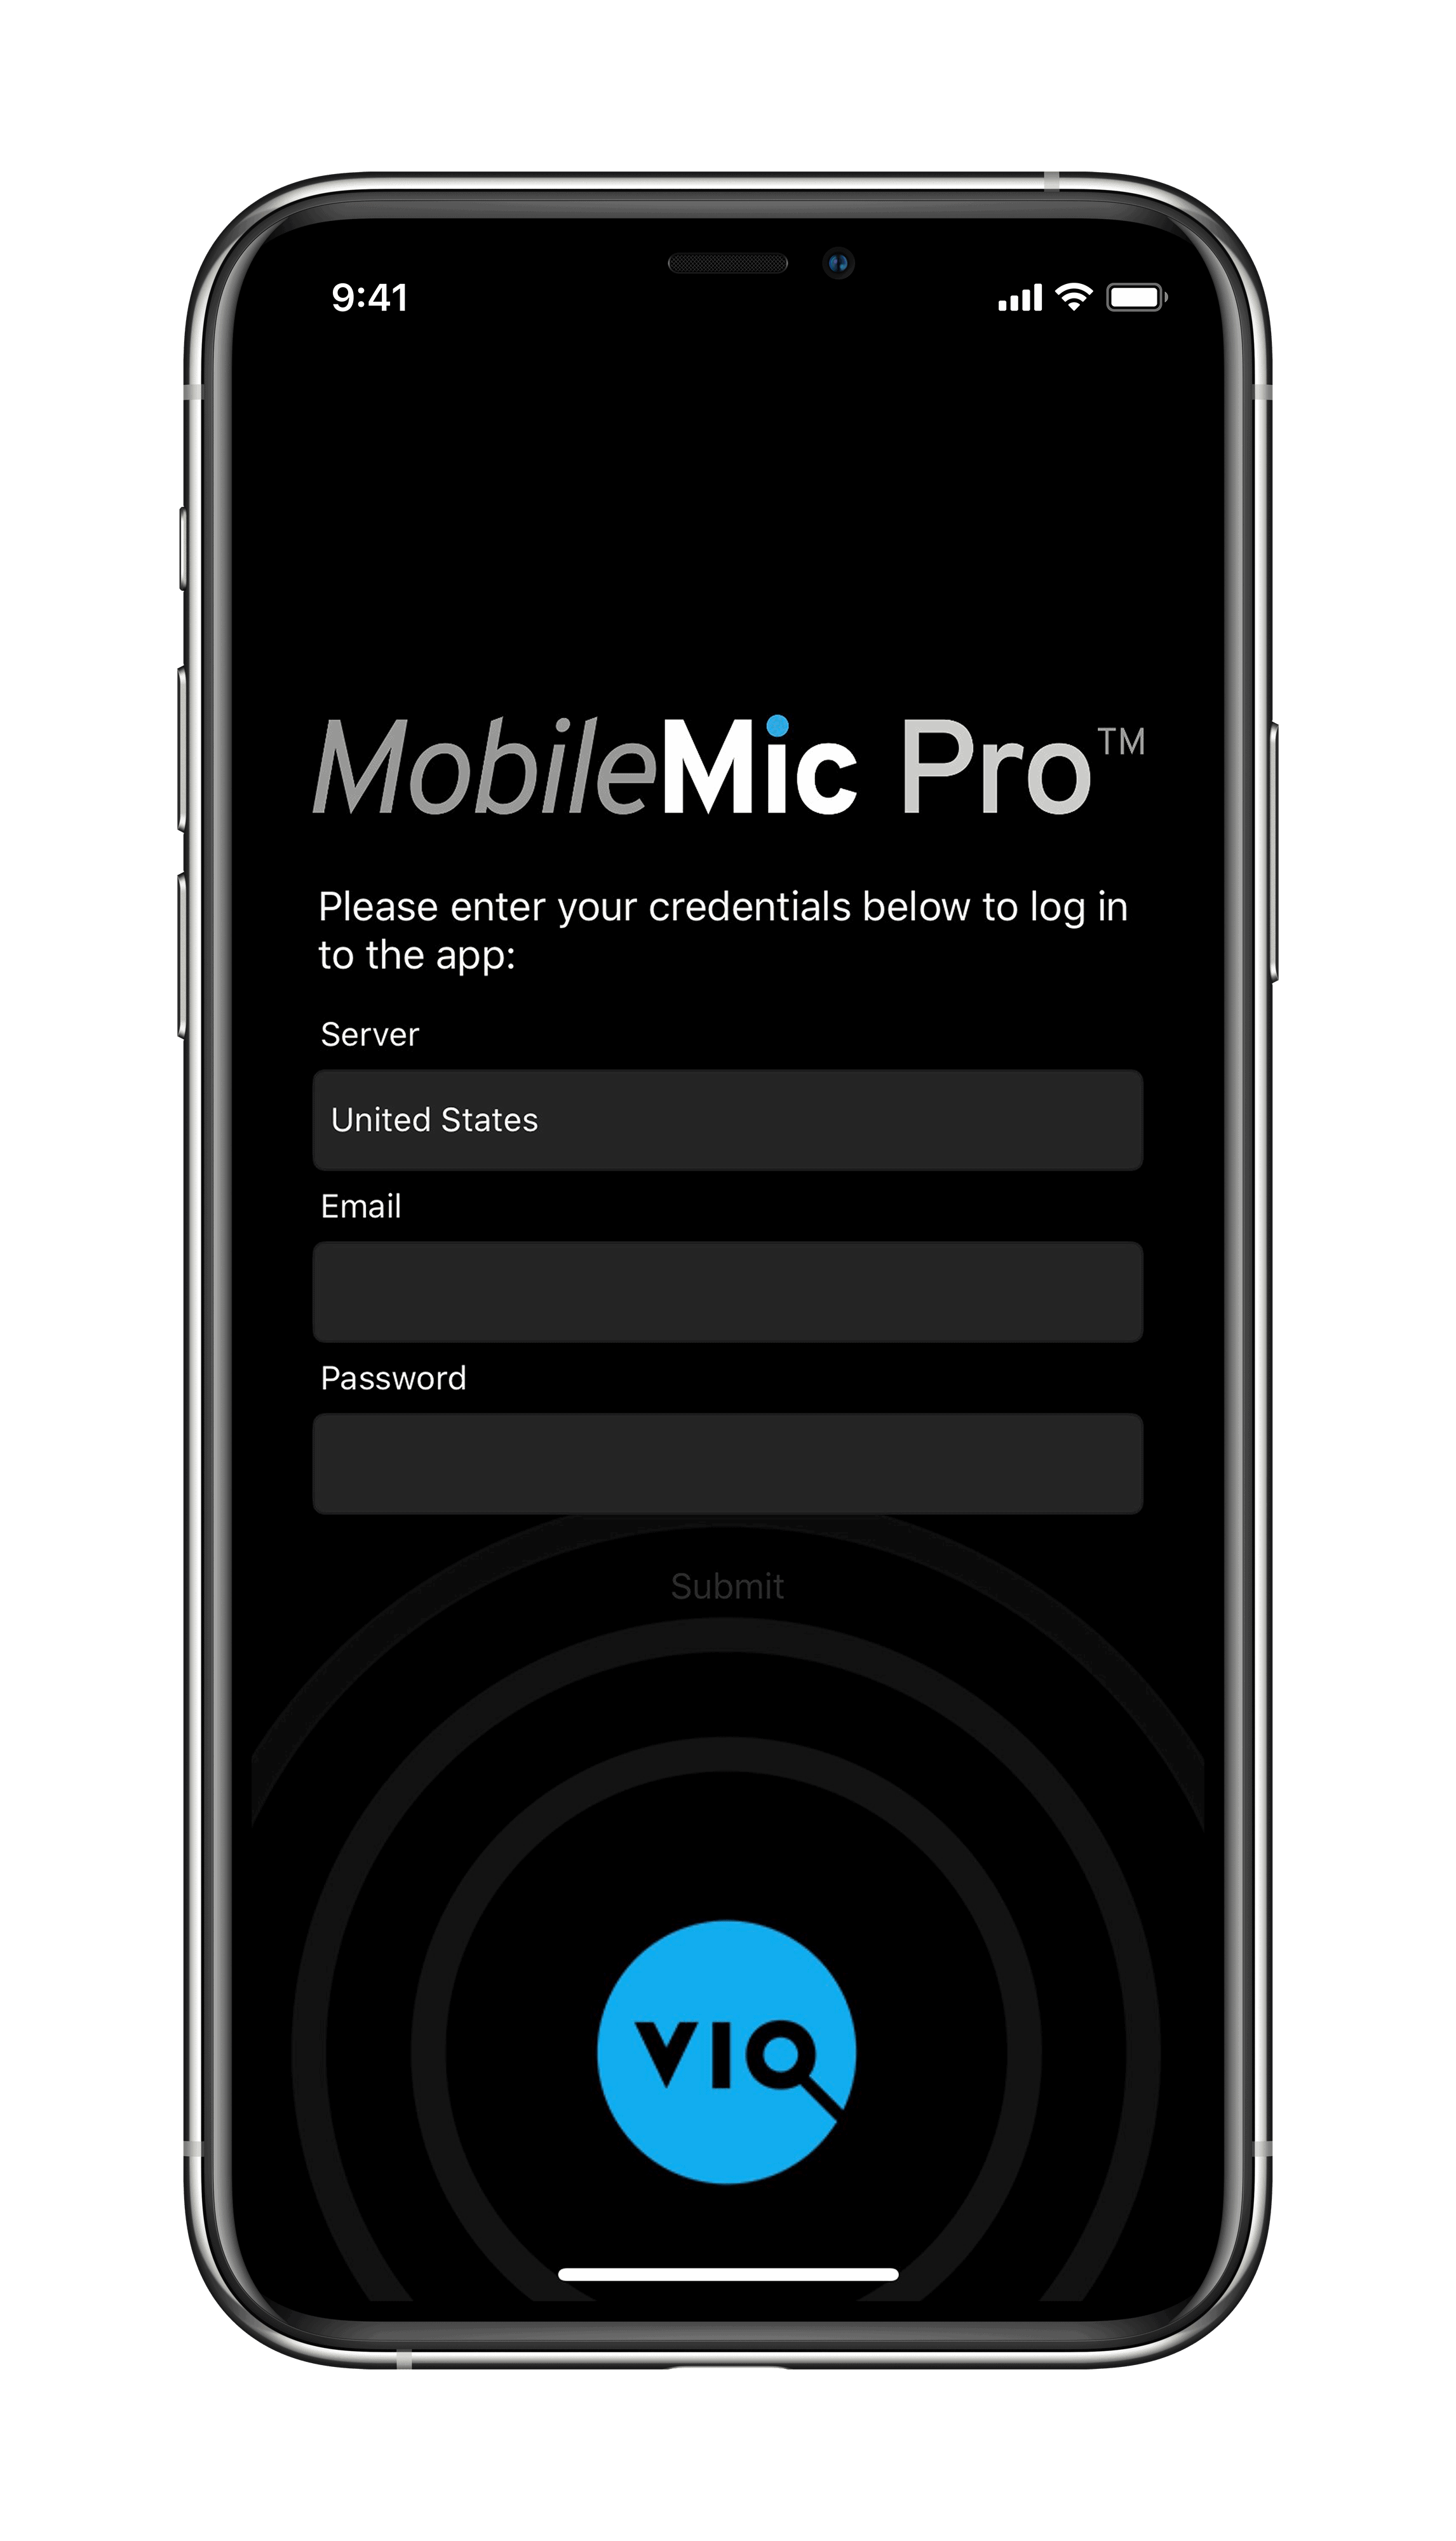 MobileMic Pro Login